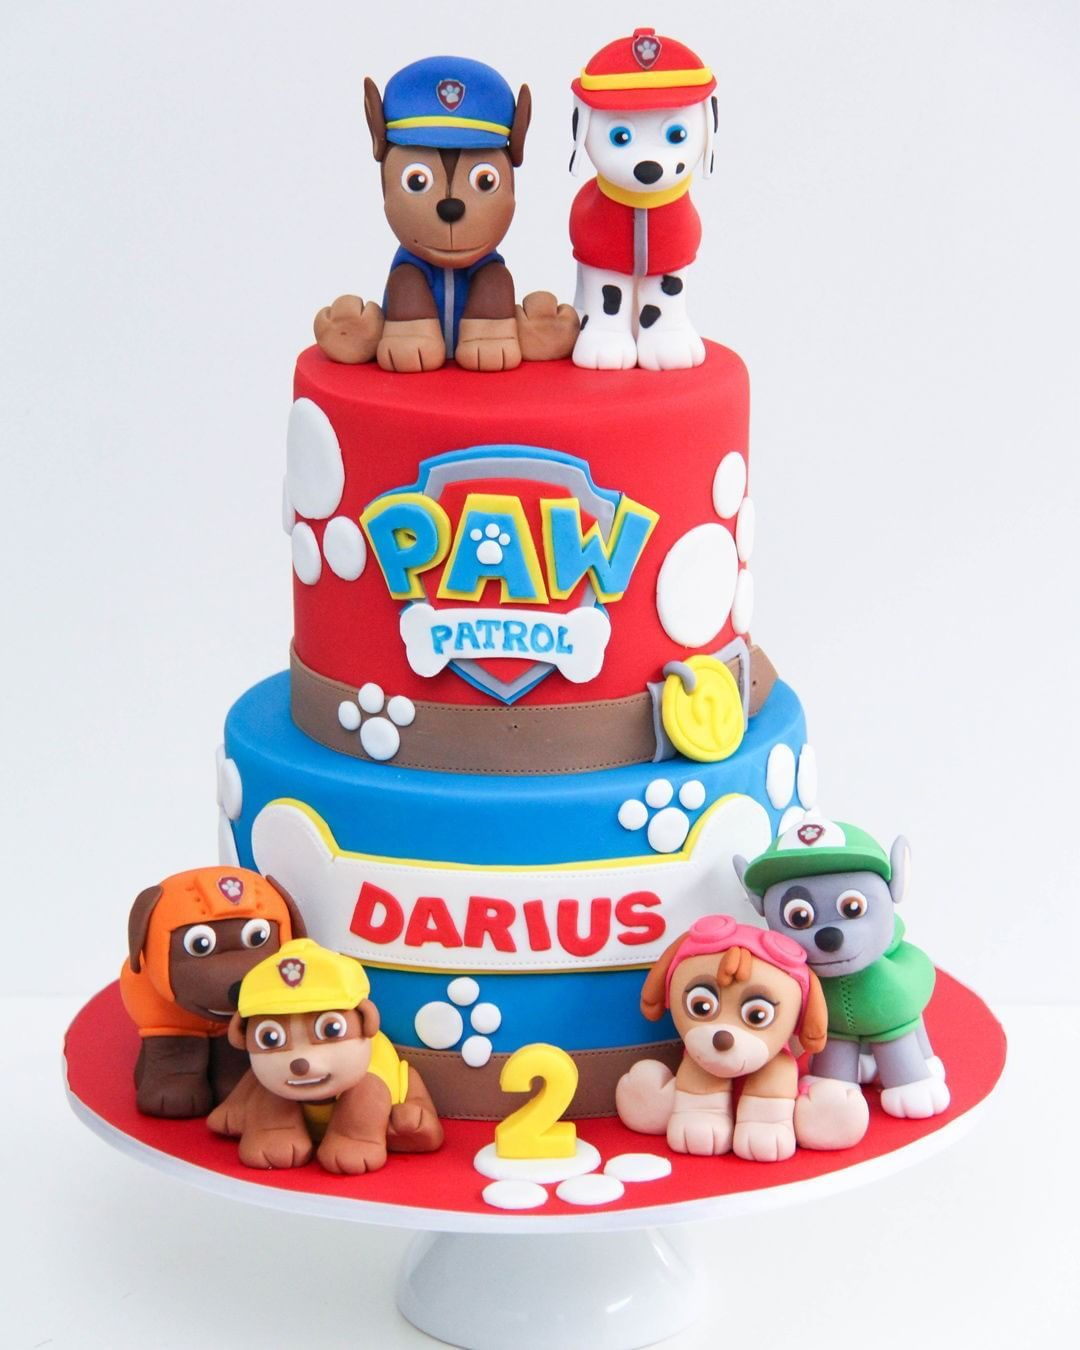 Super Birthdaycakemonday Paw Patrol Is On A Roll Funny Birthday Cards Online Alyptdamsfinfo